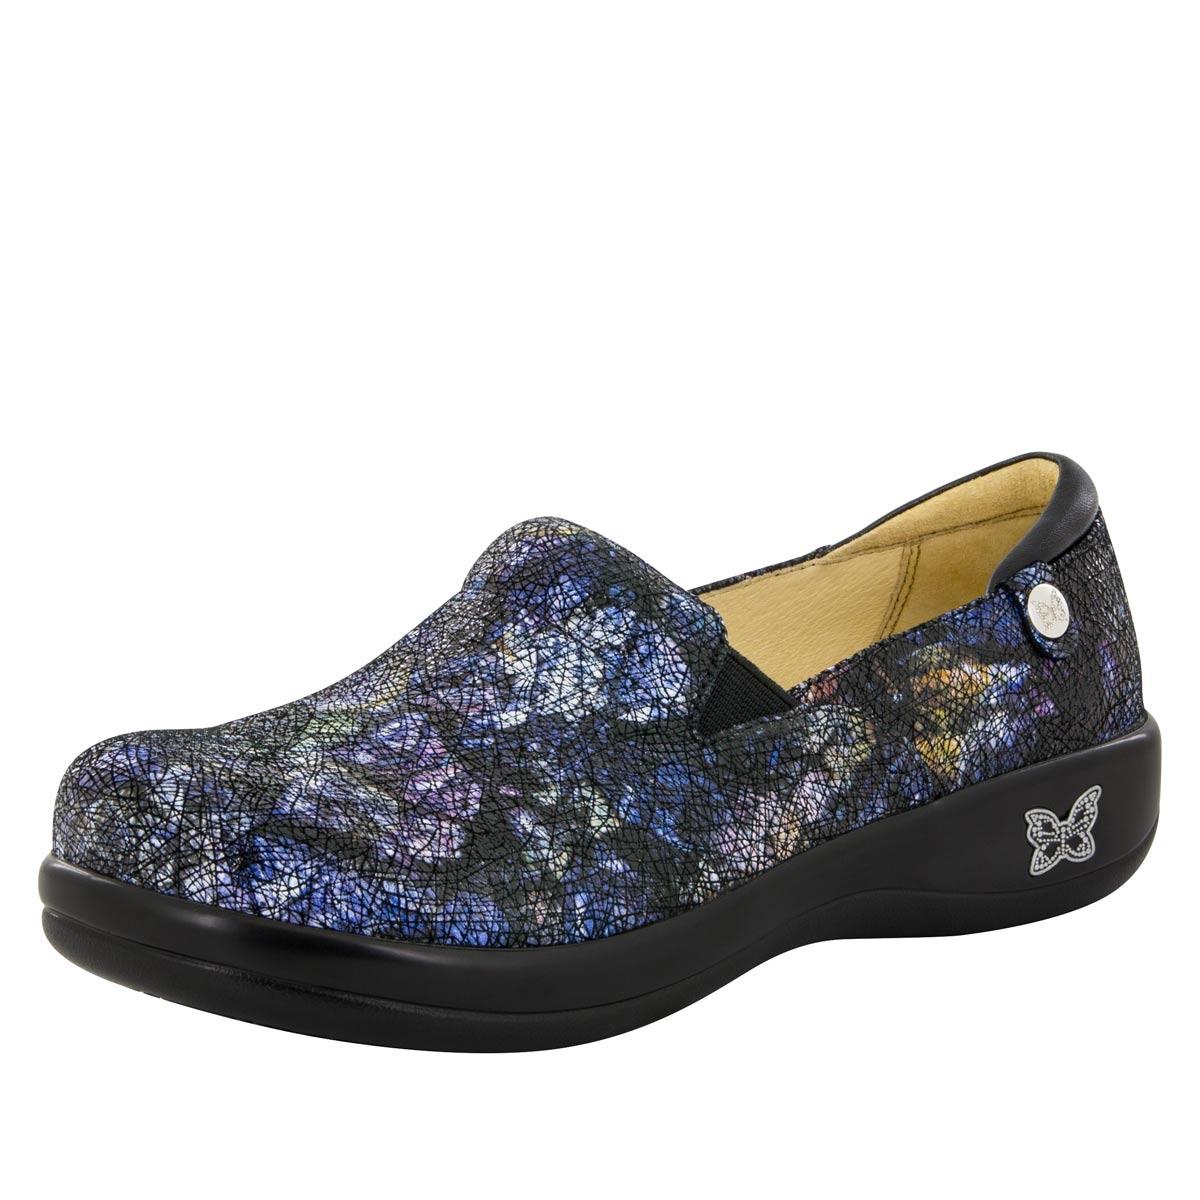 Alegria Keli PRO Quarry Crackle womens comfort nursing shoe